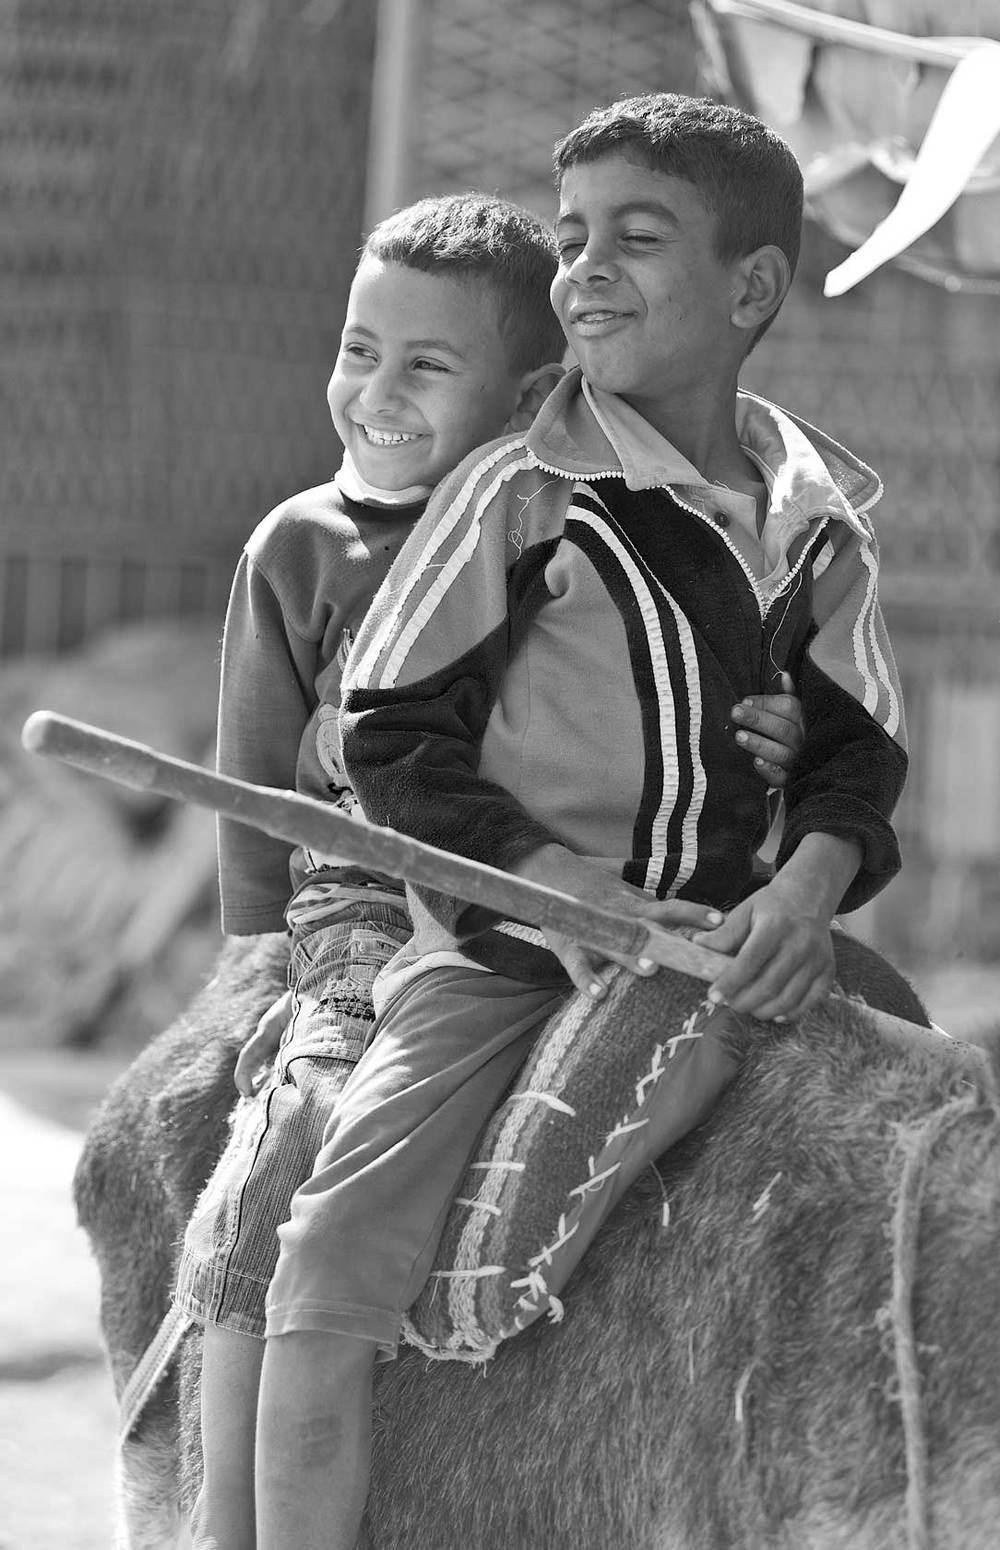 090100_DSC3108-kids-in-Luxor-village-mugging-for-camera.jpg